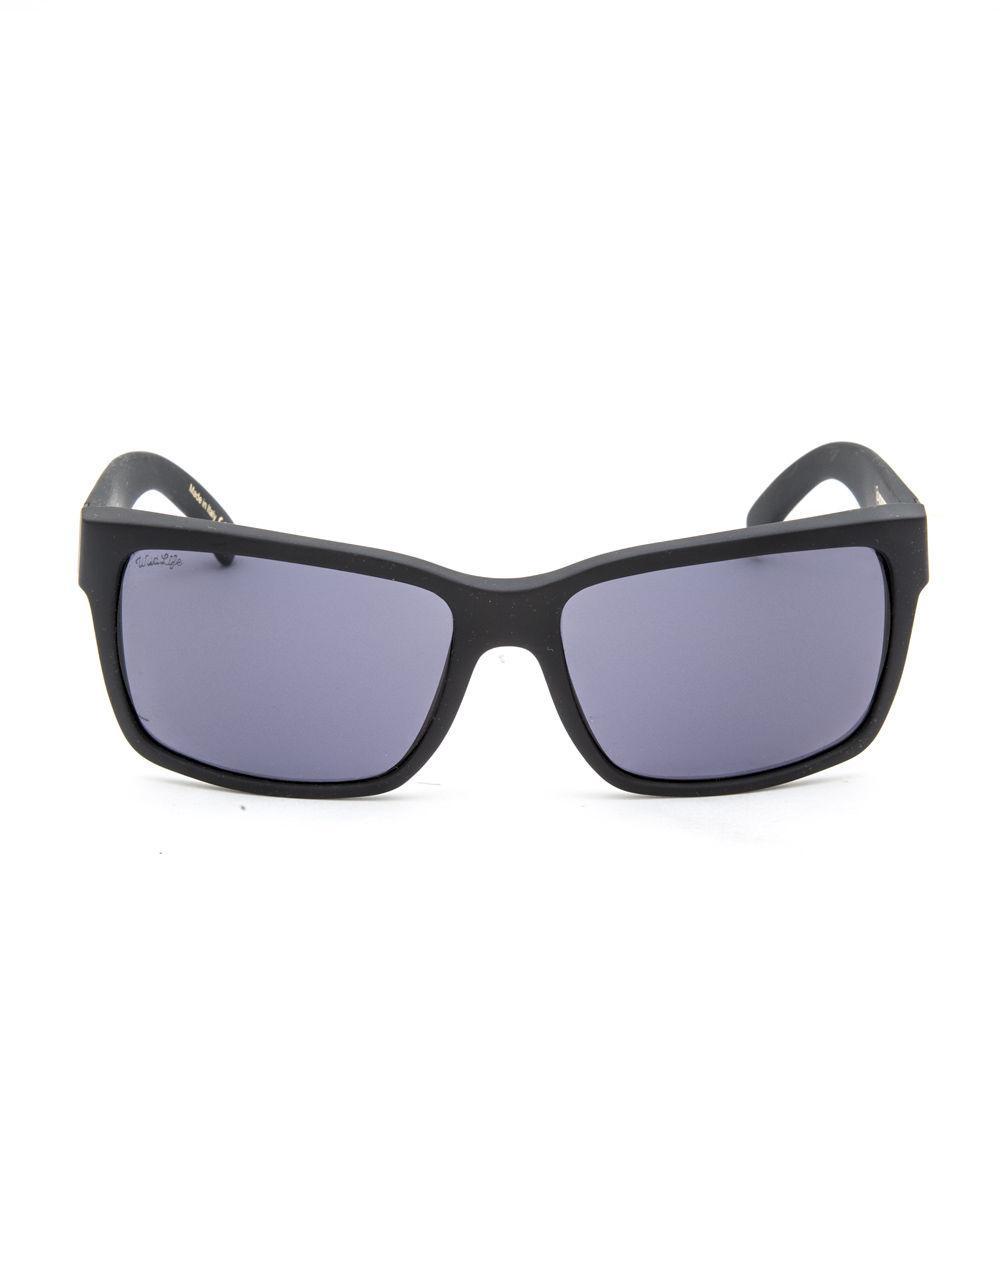 d609a601b9 Lyst - Von Zipper Elmore Wildlife Matte Black   Grey Polarized Sunglasses  in Gray for Men